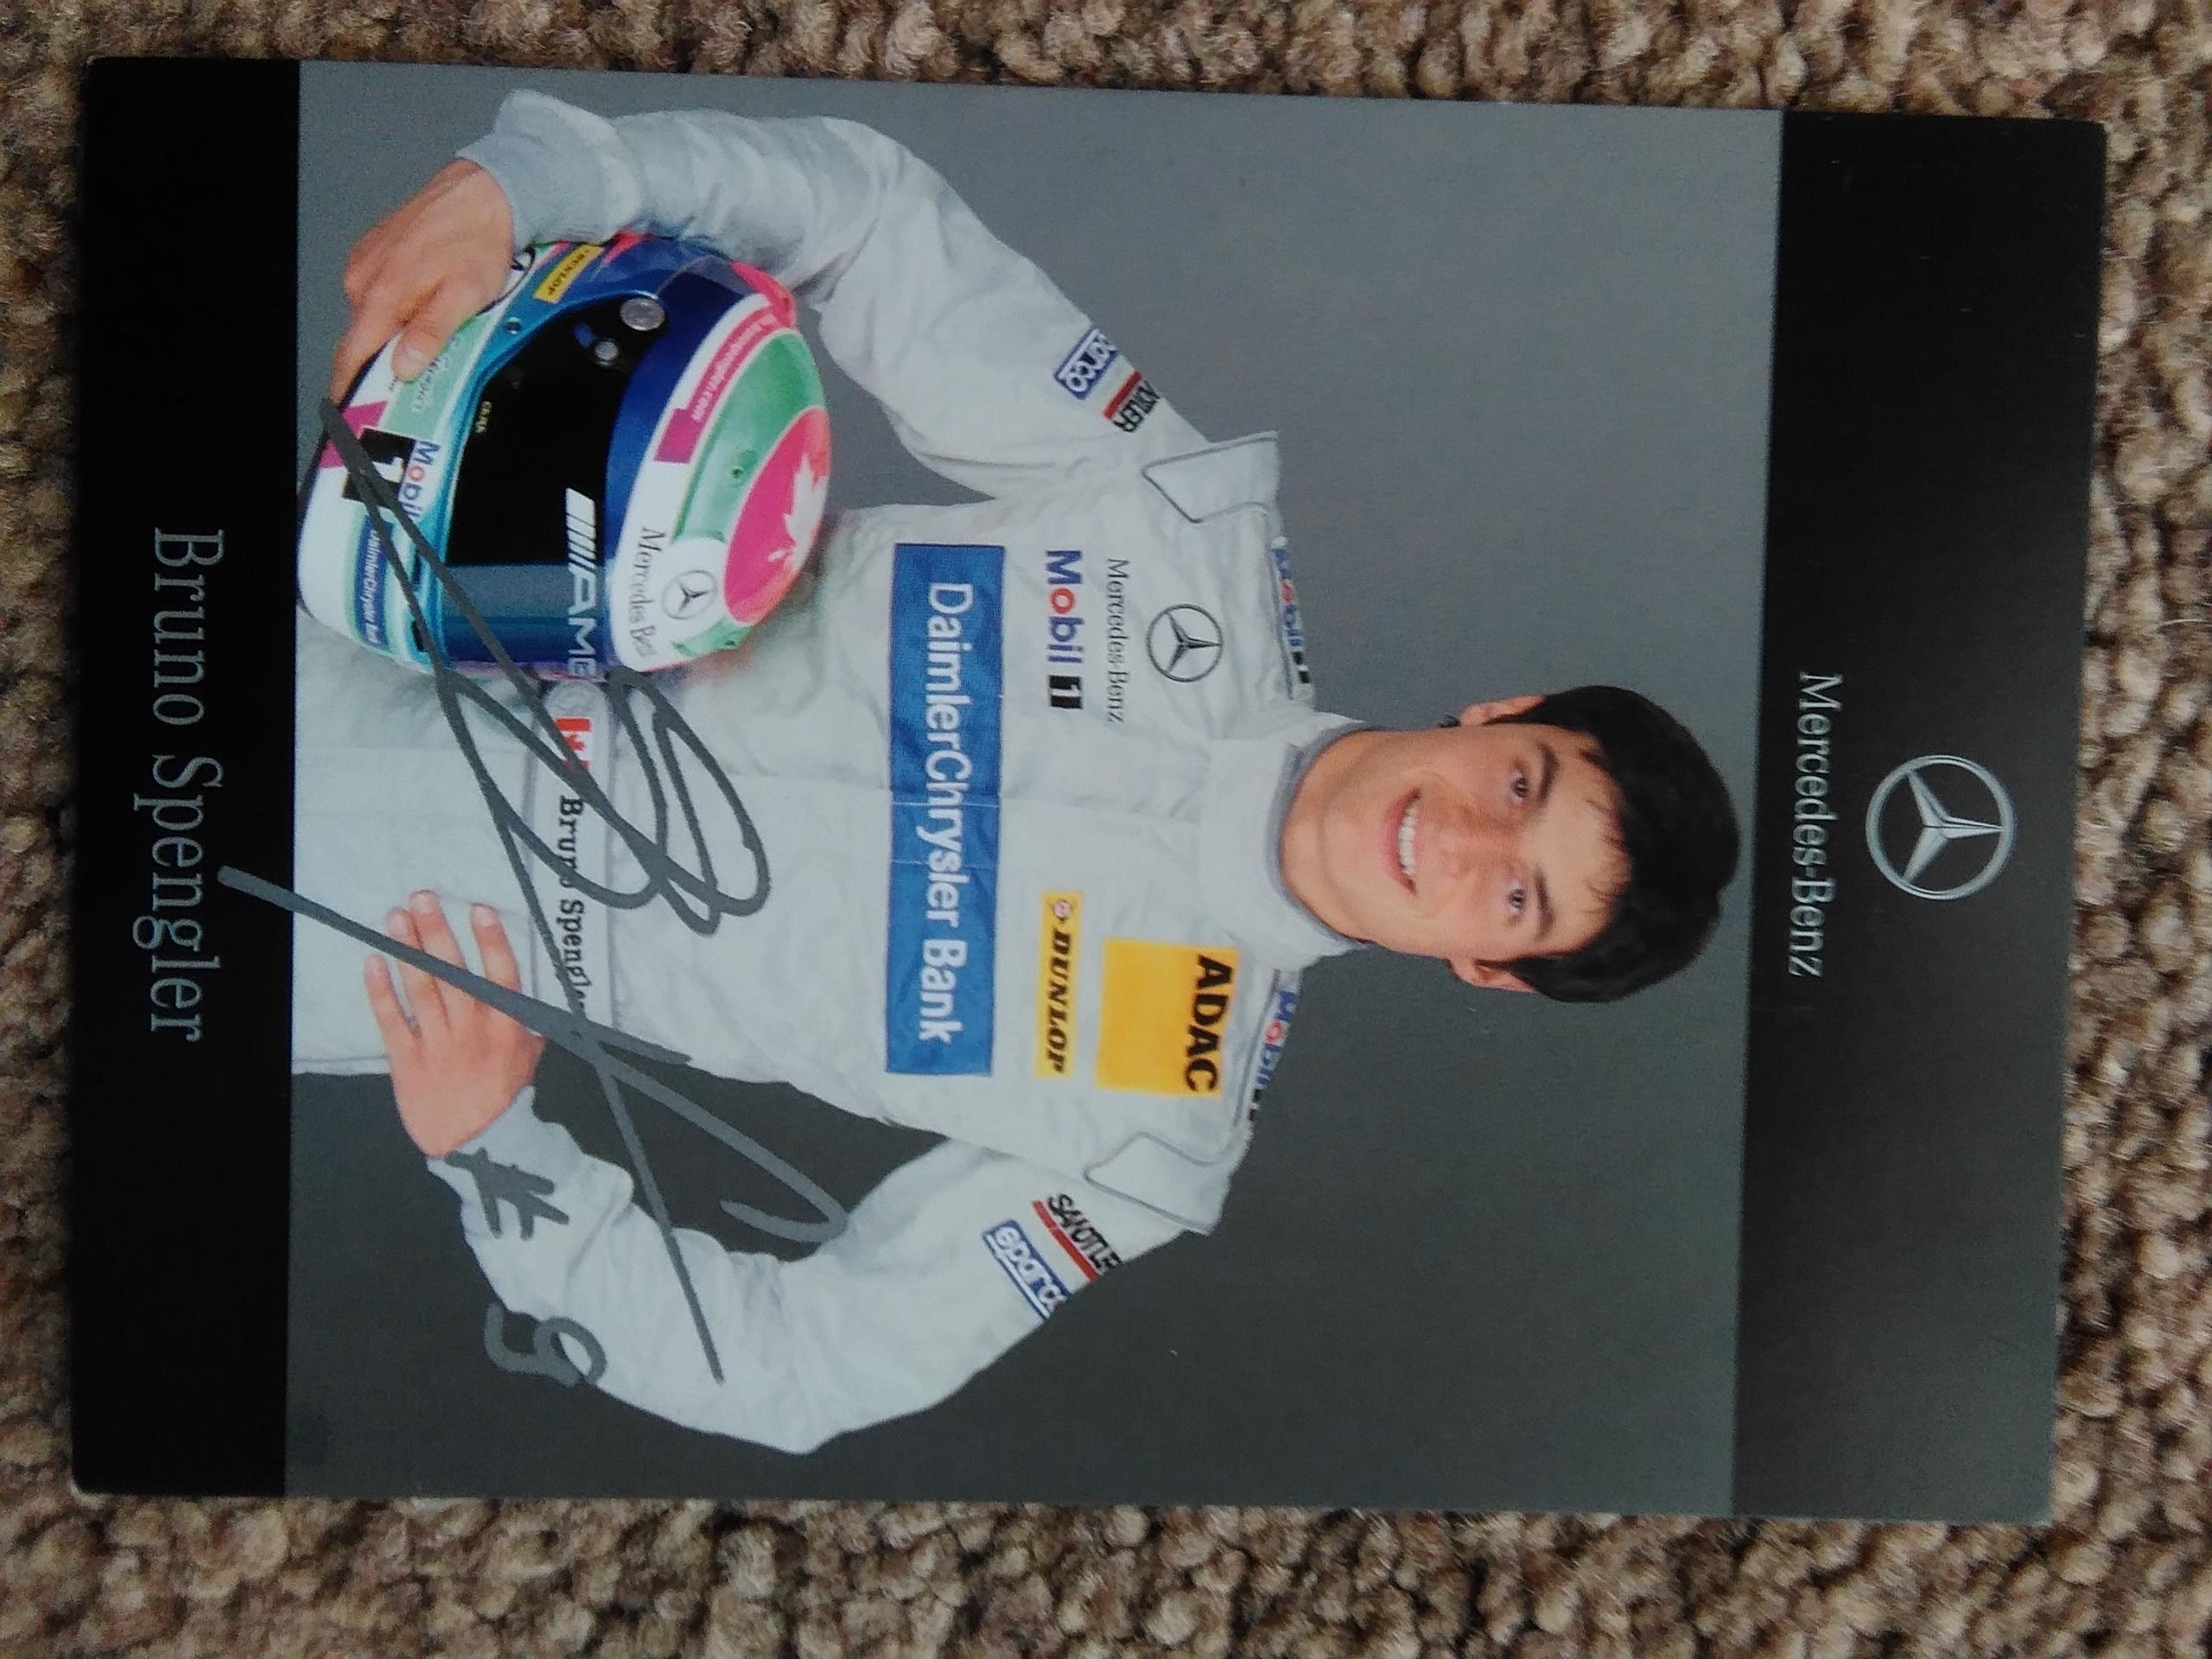 Bruno Spengler Signed DTM Card